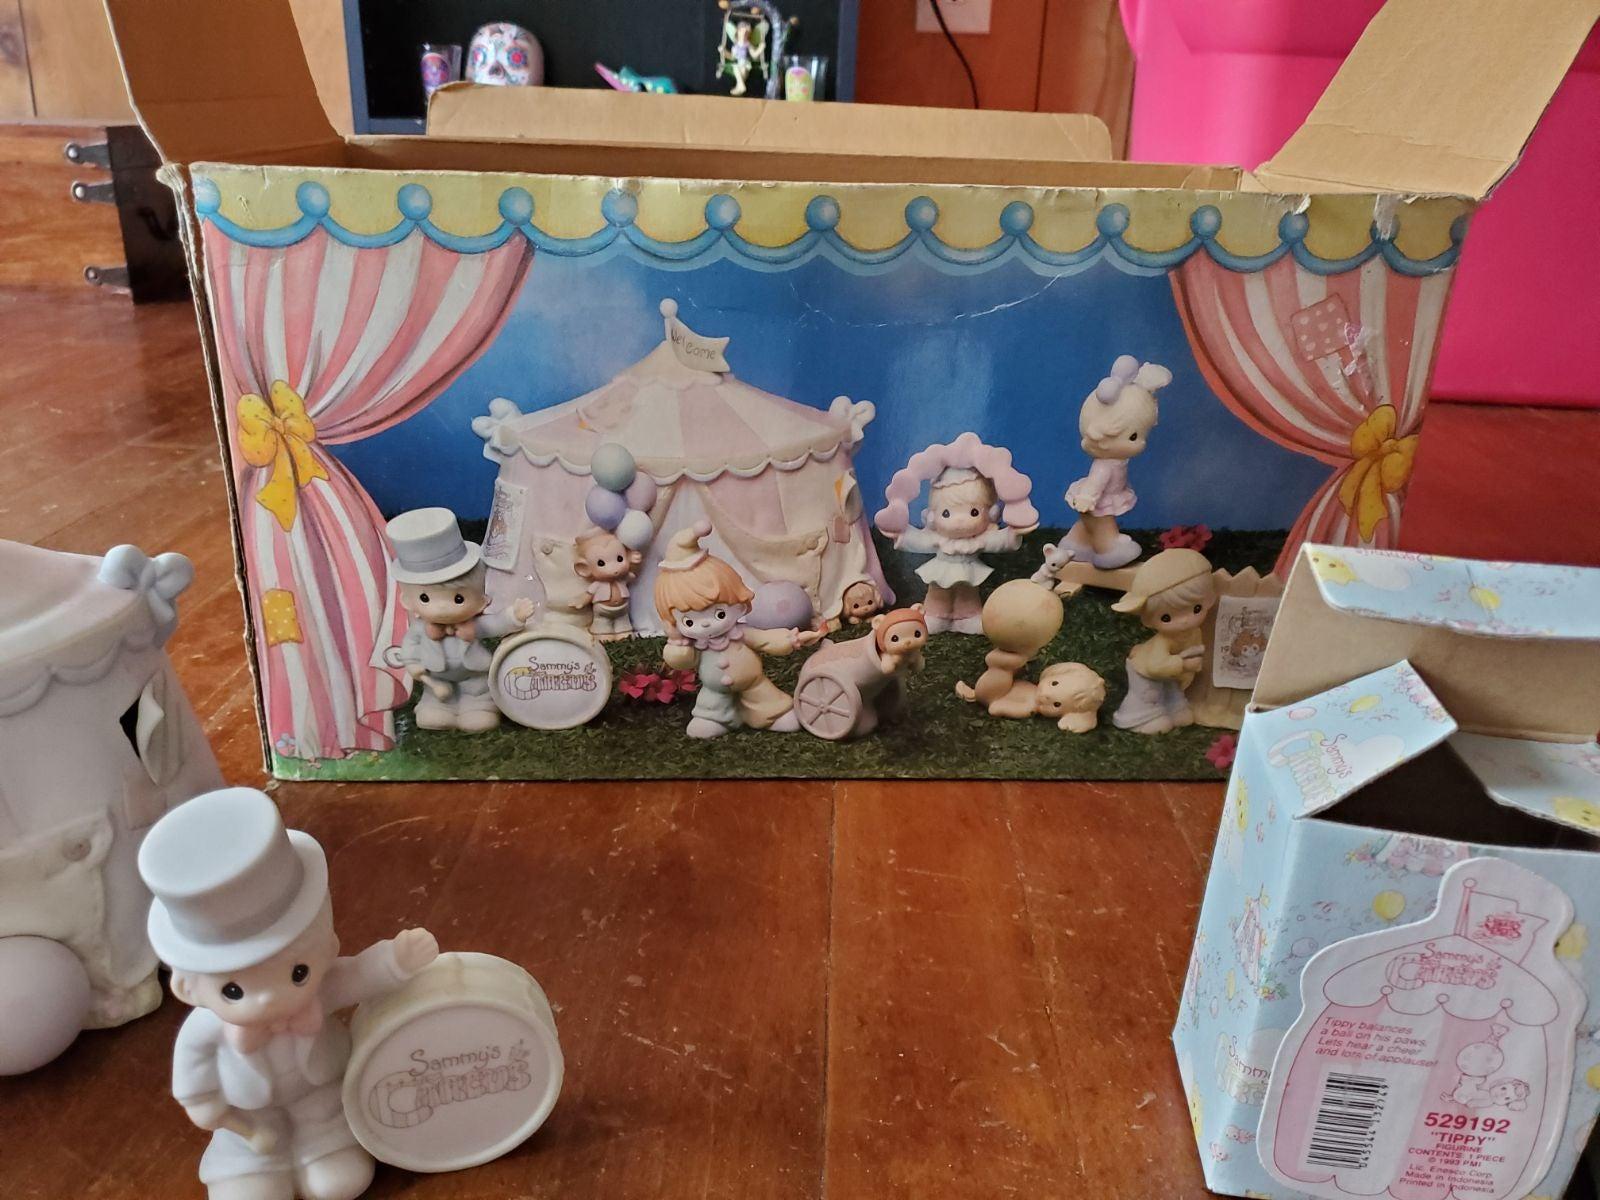 1993 Sammy's circus set